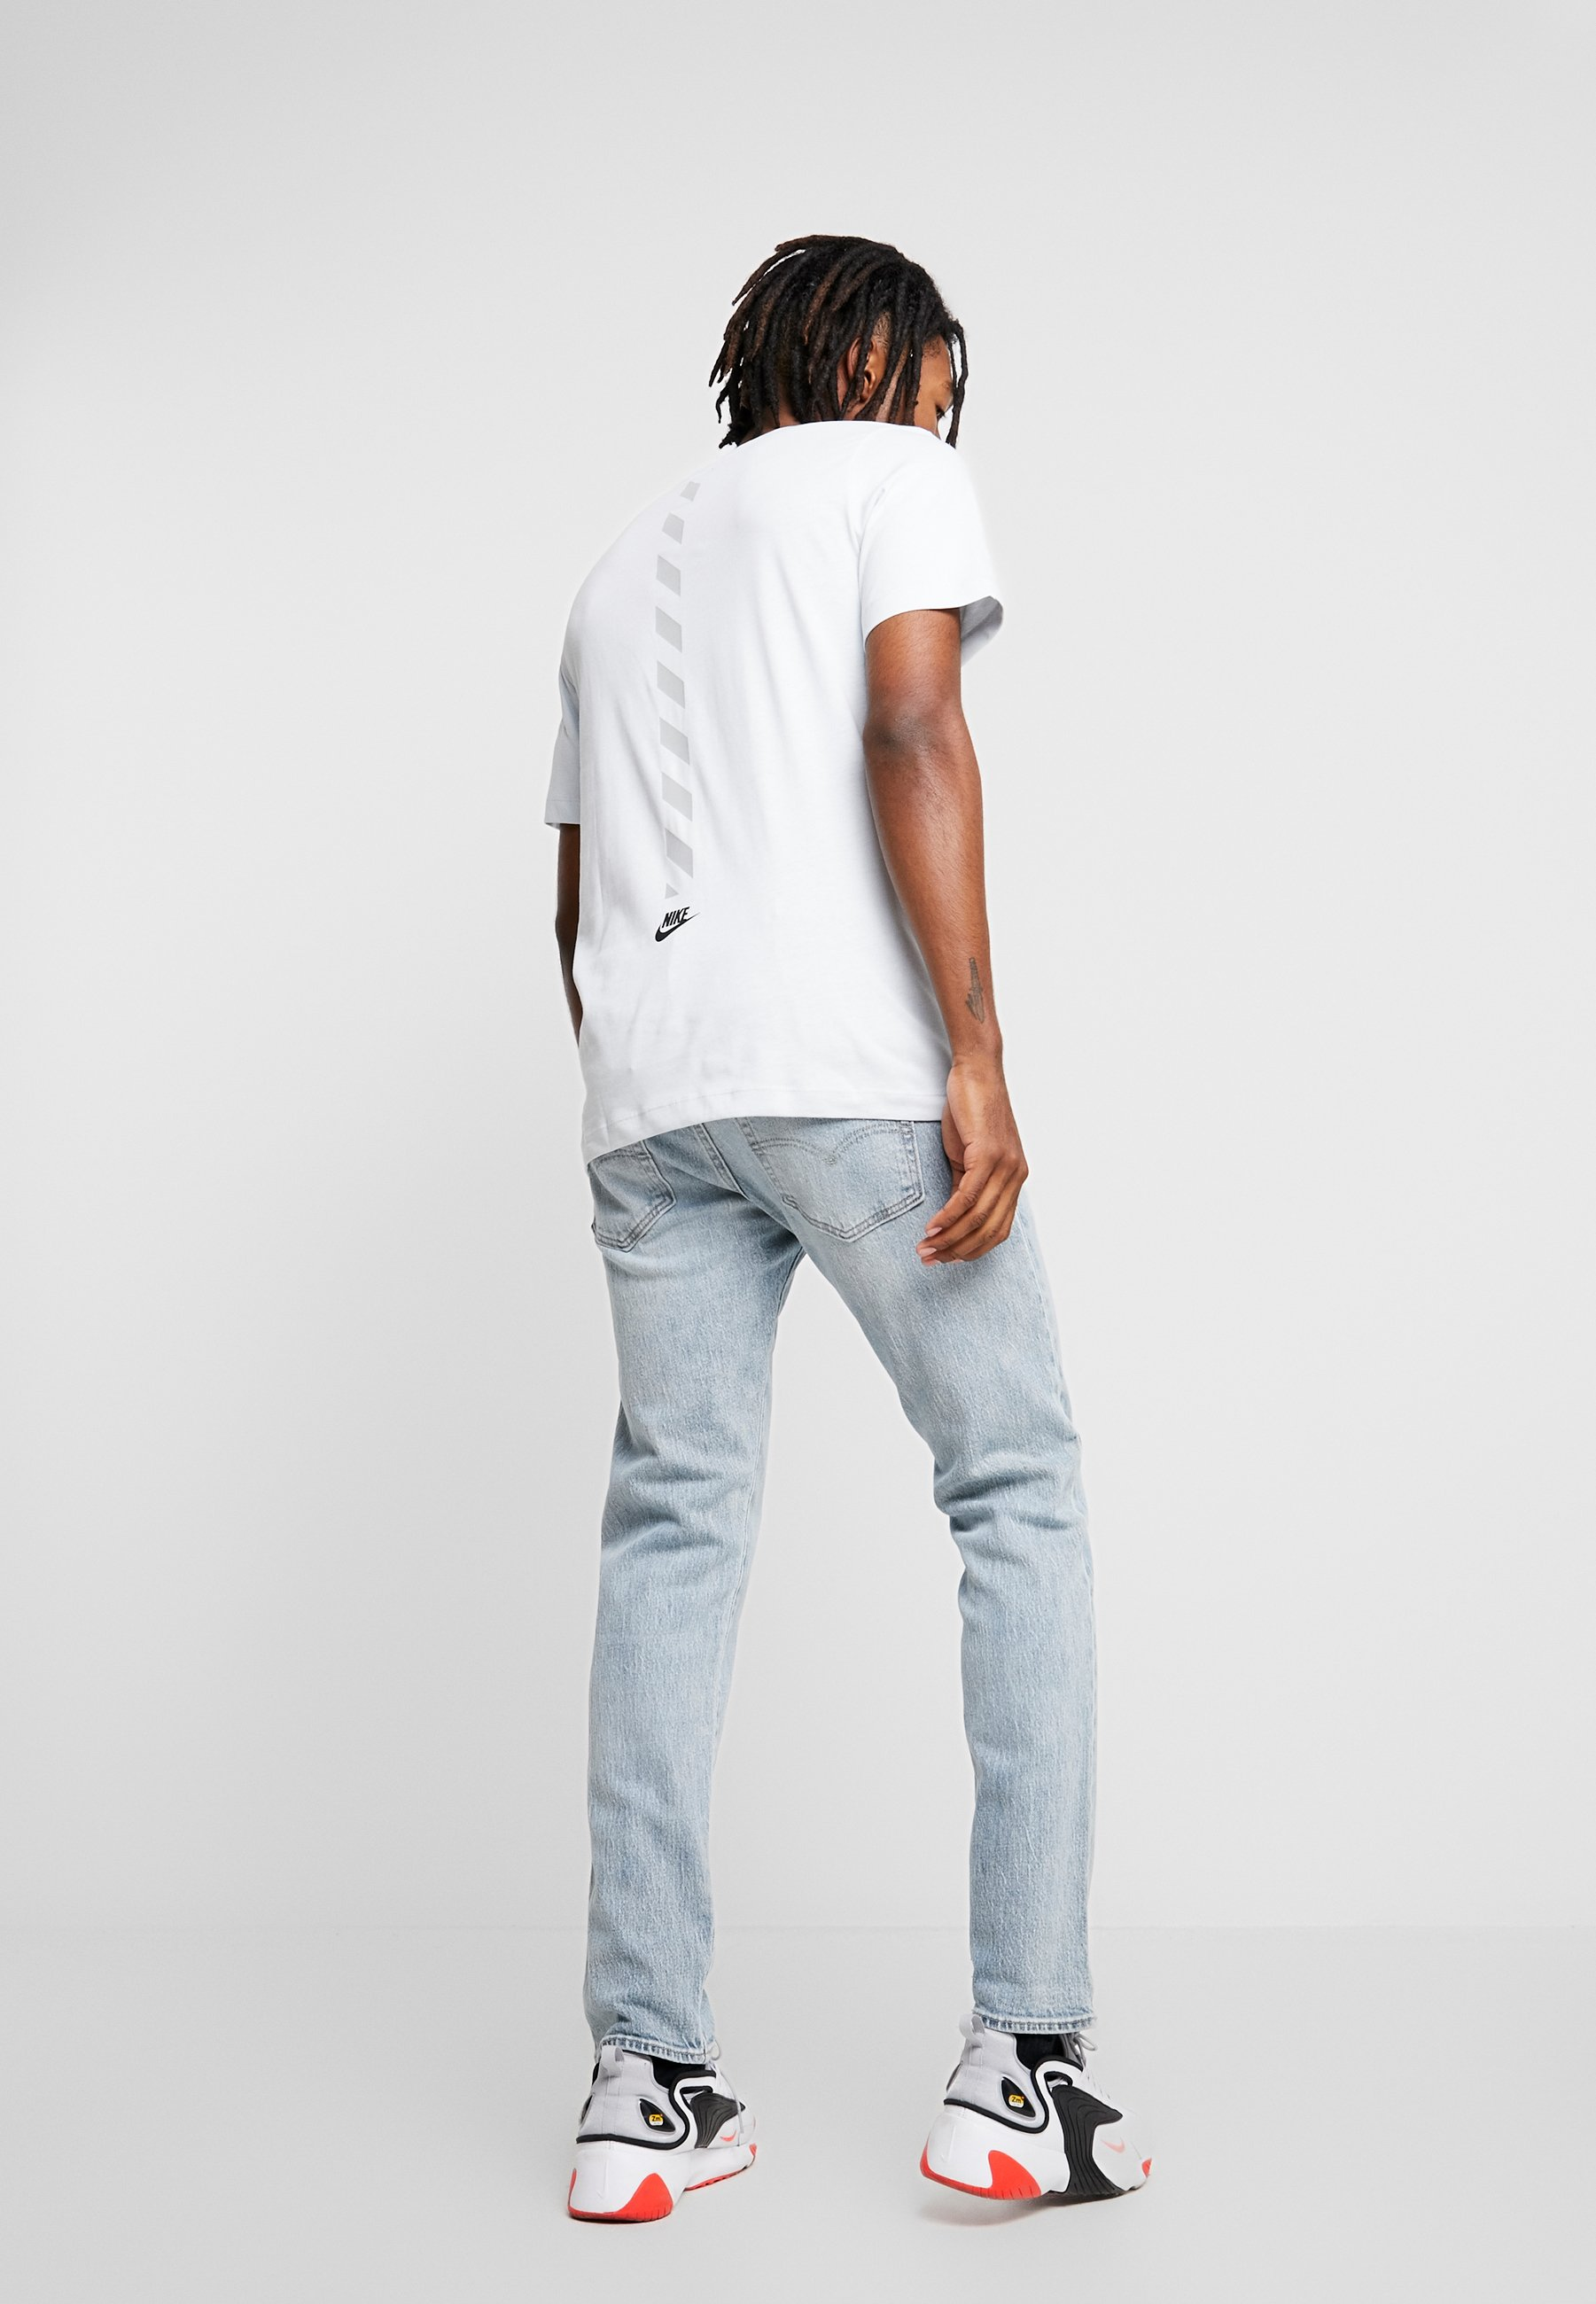 shirt Sportswear Nike Subset Imprimé Platinum TeeT Pure 8nOP0wkX